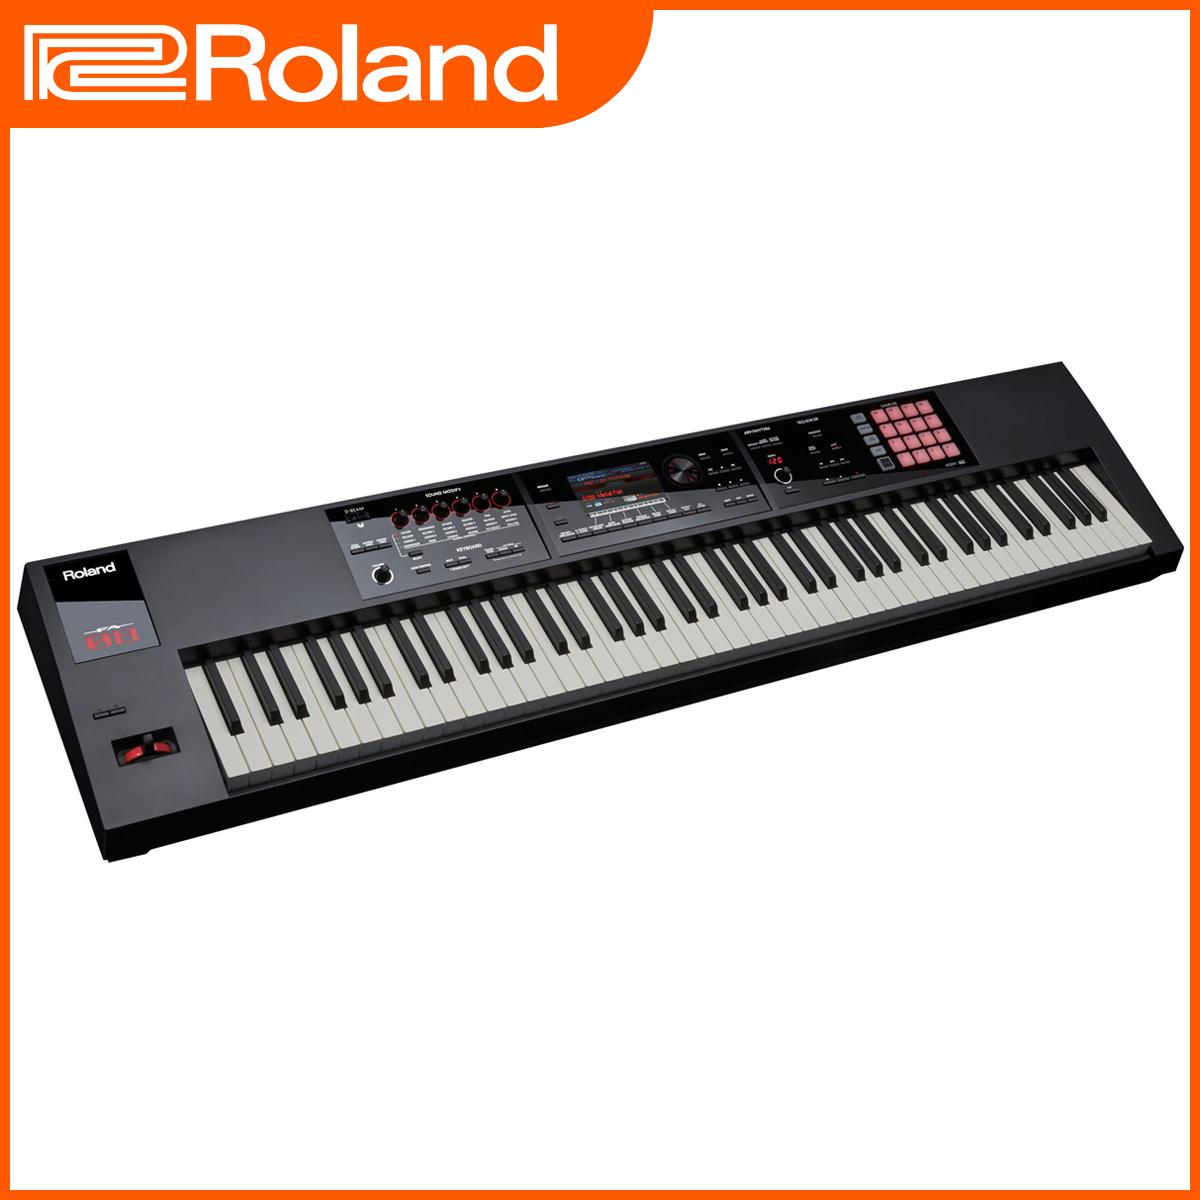 Roland ローランド / FA-08 シンセサイザー(FA08) 【YRK】